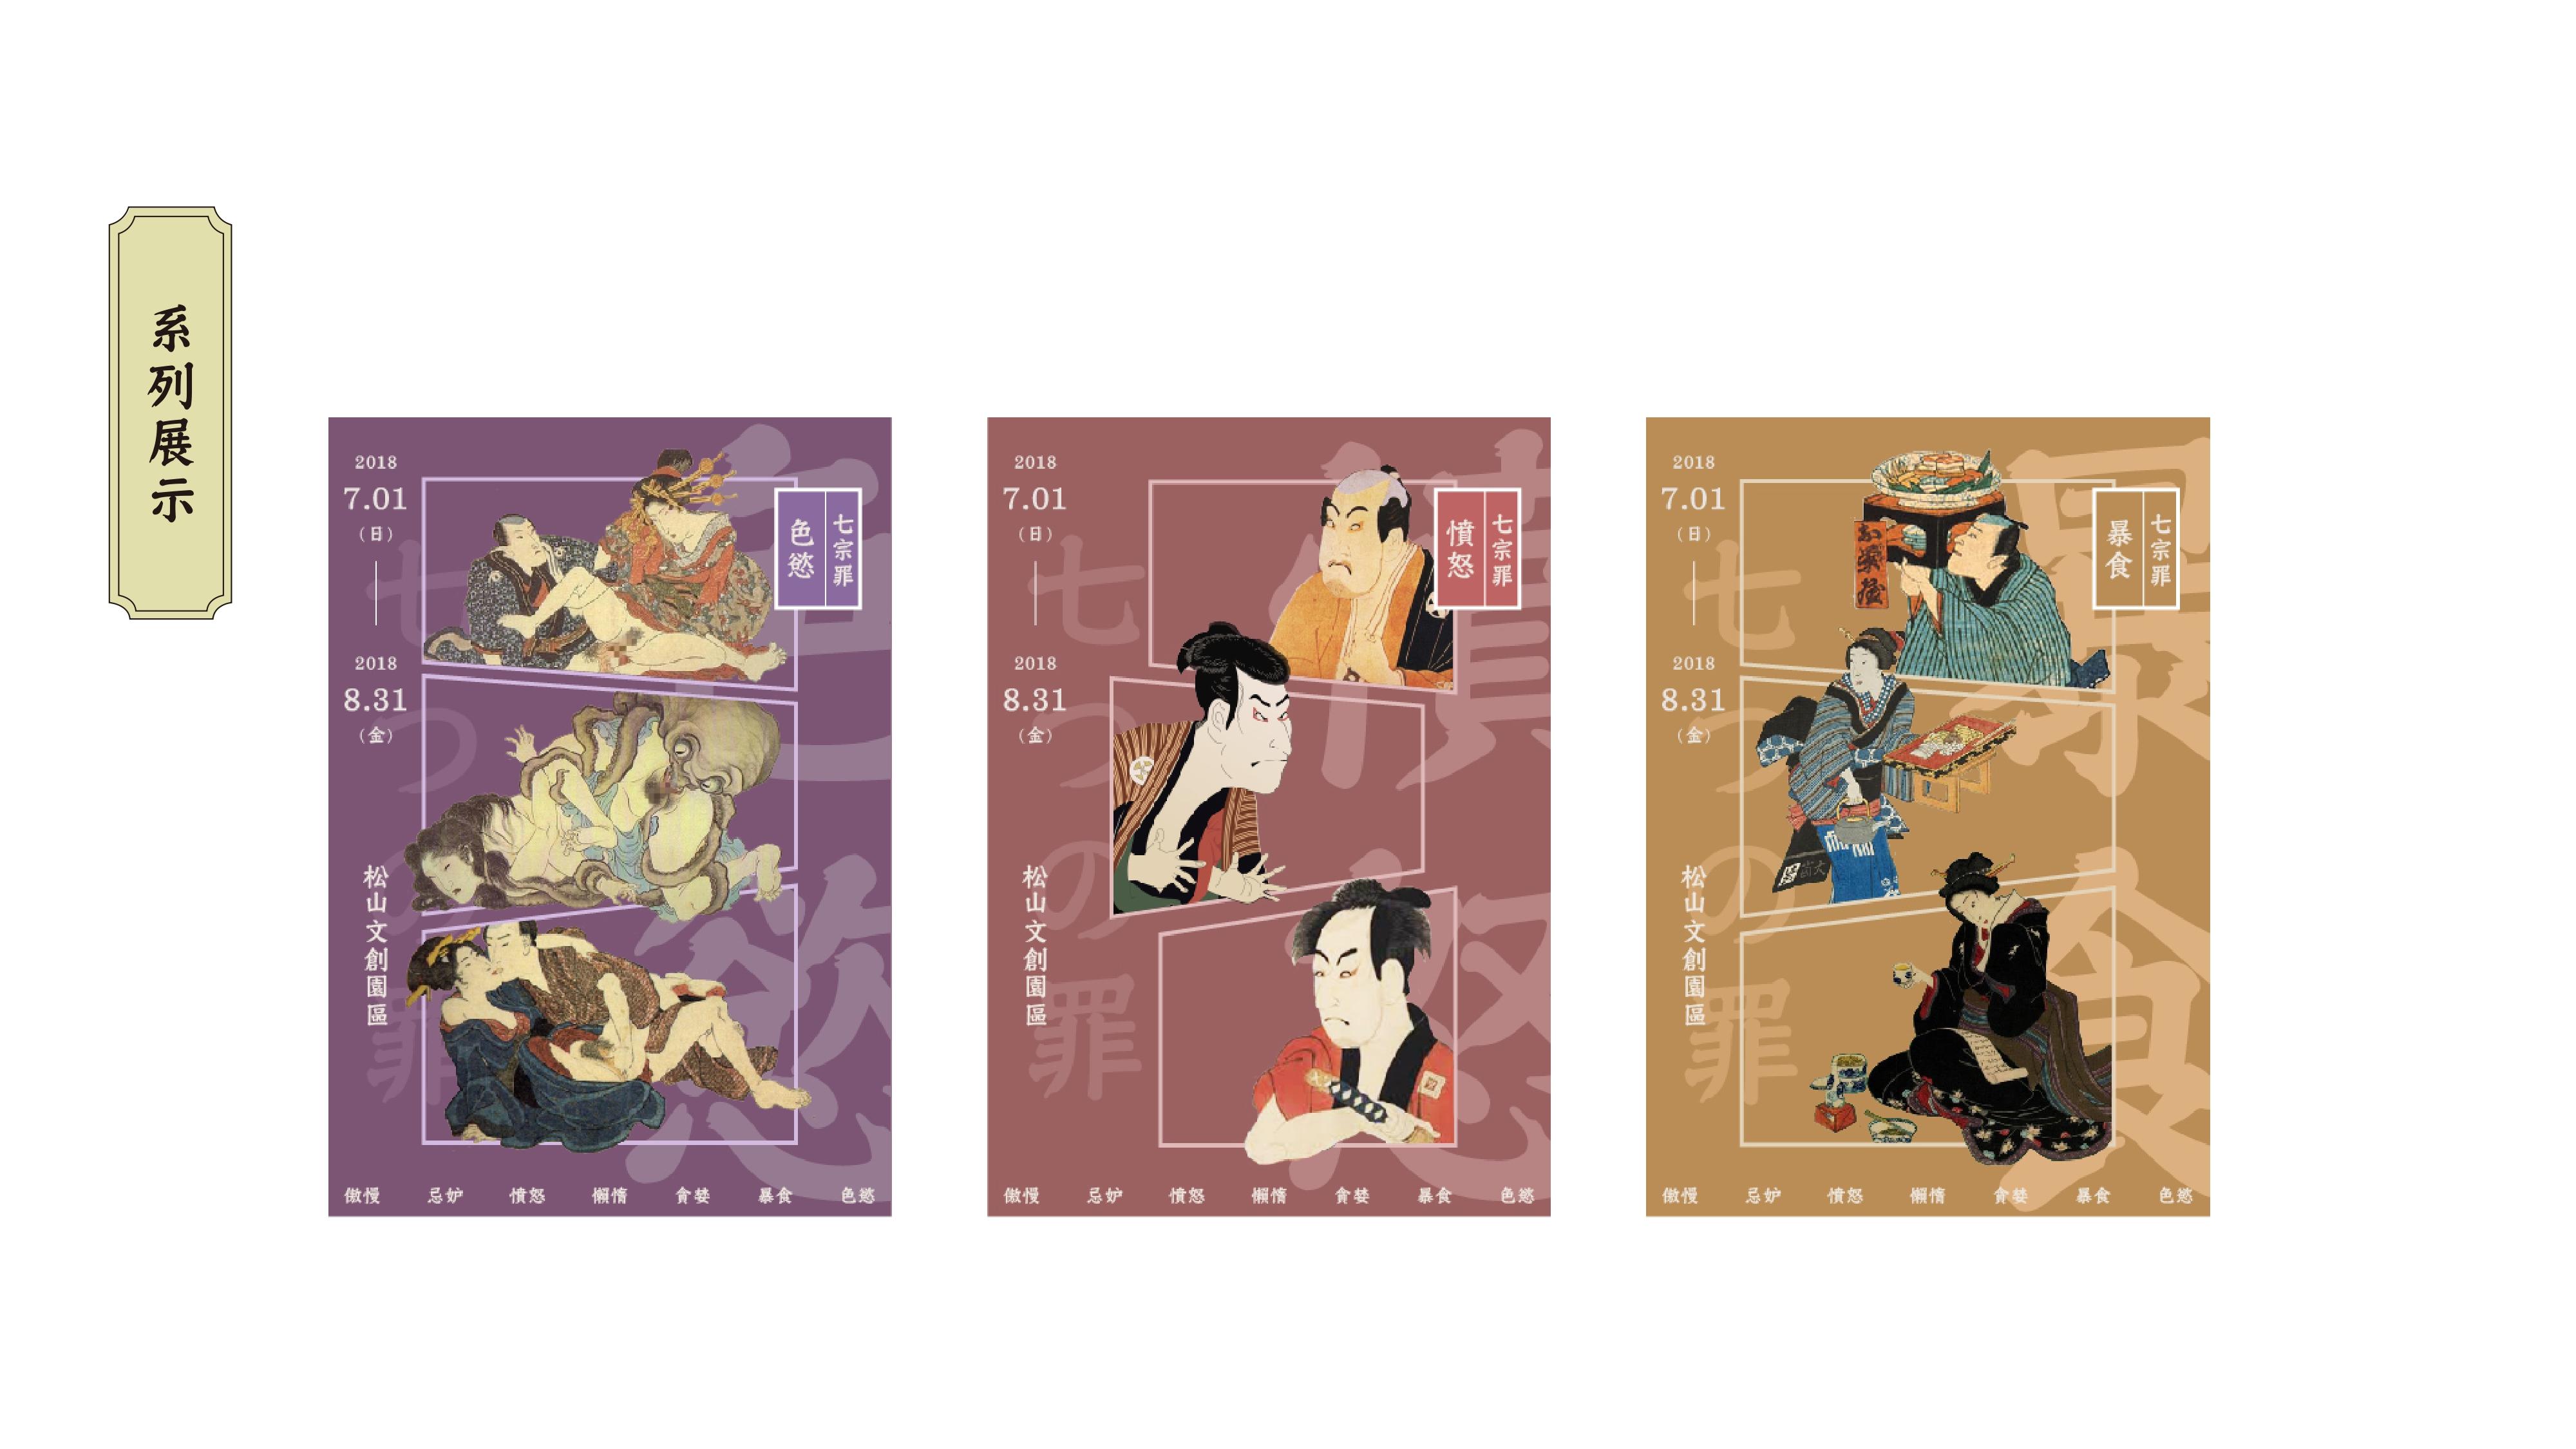 七宗罪_pages-to-jpg-0005